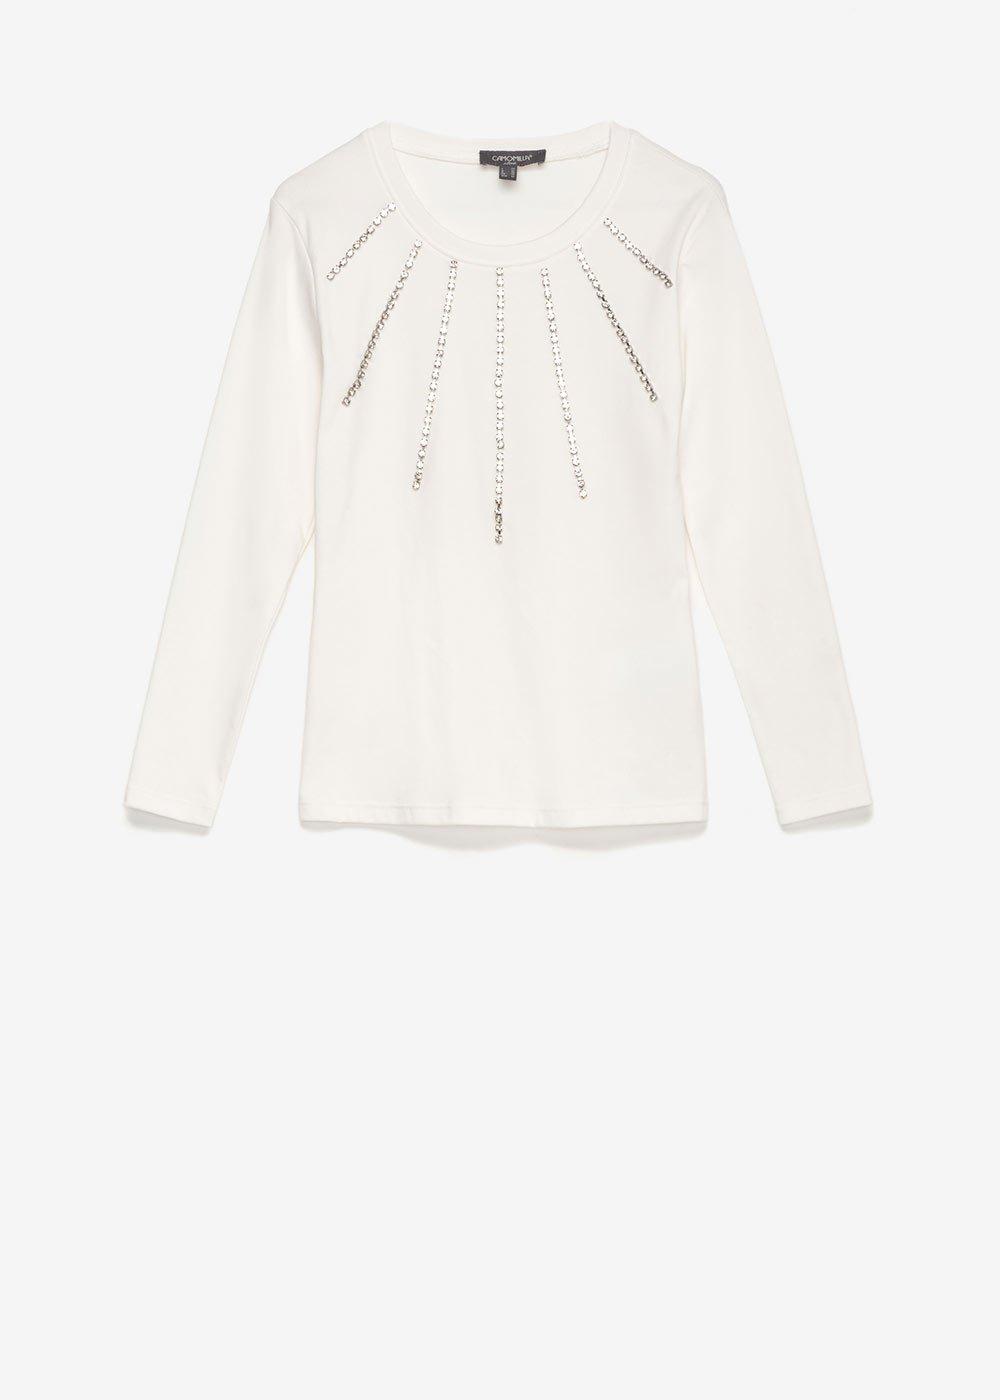 Sabrin t-shirt with rhinestones - White - Woman